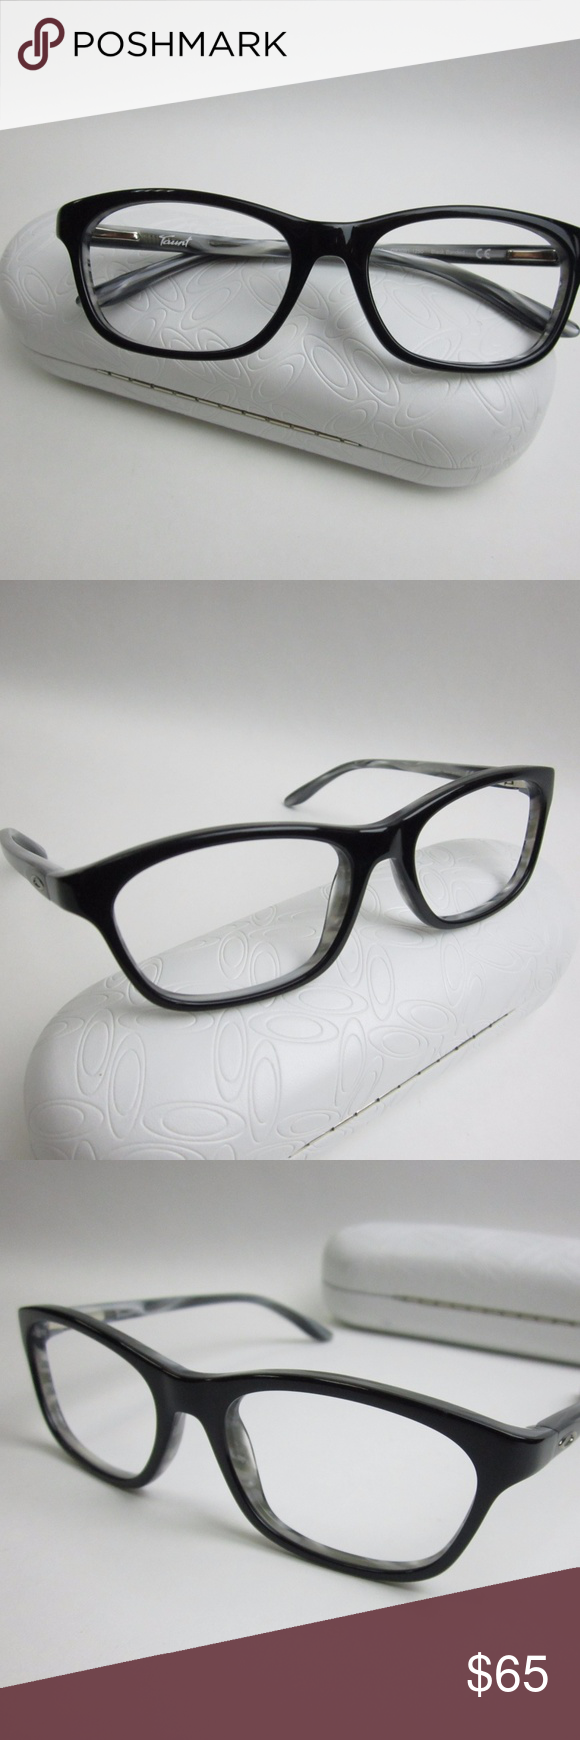 ac32b0b44f60 Oakley Taunt OX1091-1250 Women s Eyeglasses STI831 Oakley Taunt OX1091-1250  Women s Eyeglasses